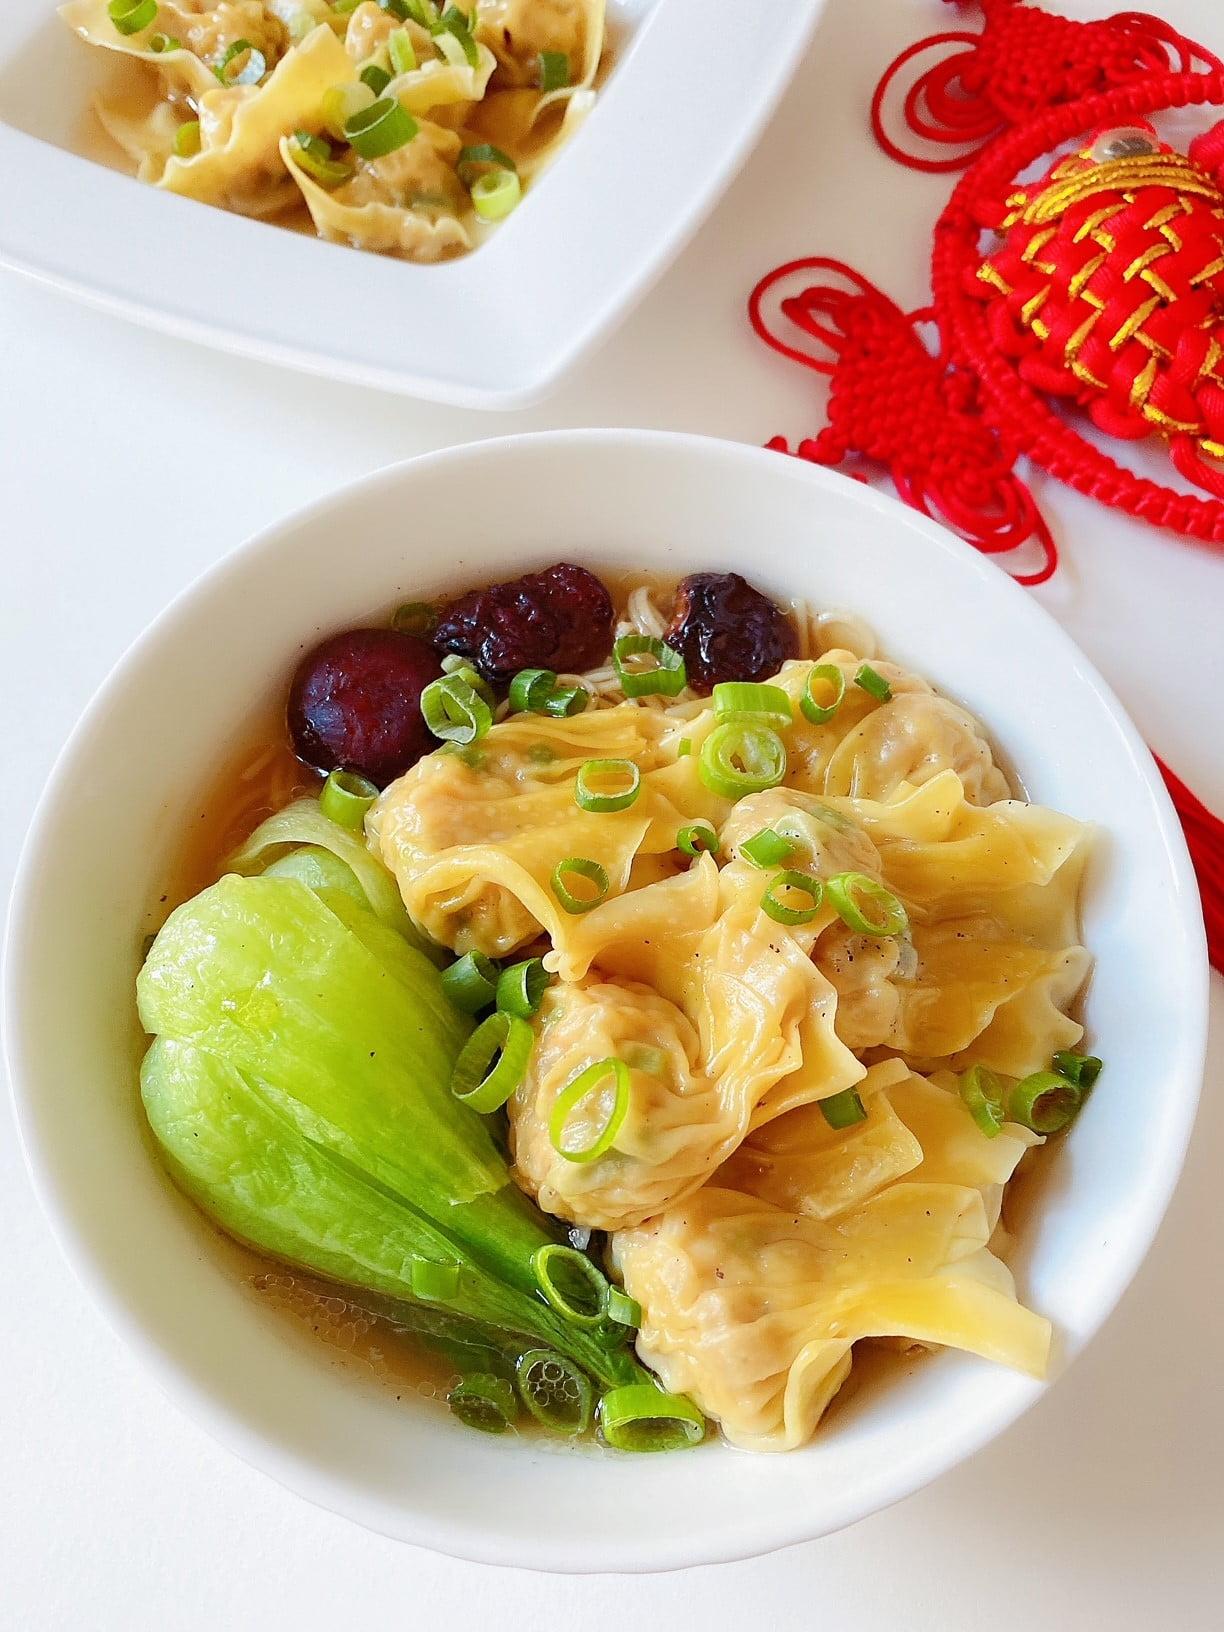 Cantonese Style Wonton Noodle Soup 广式云吞面 - COOK COOK GO